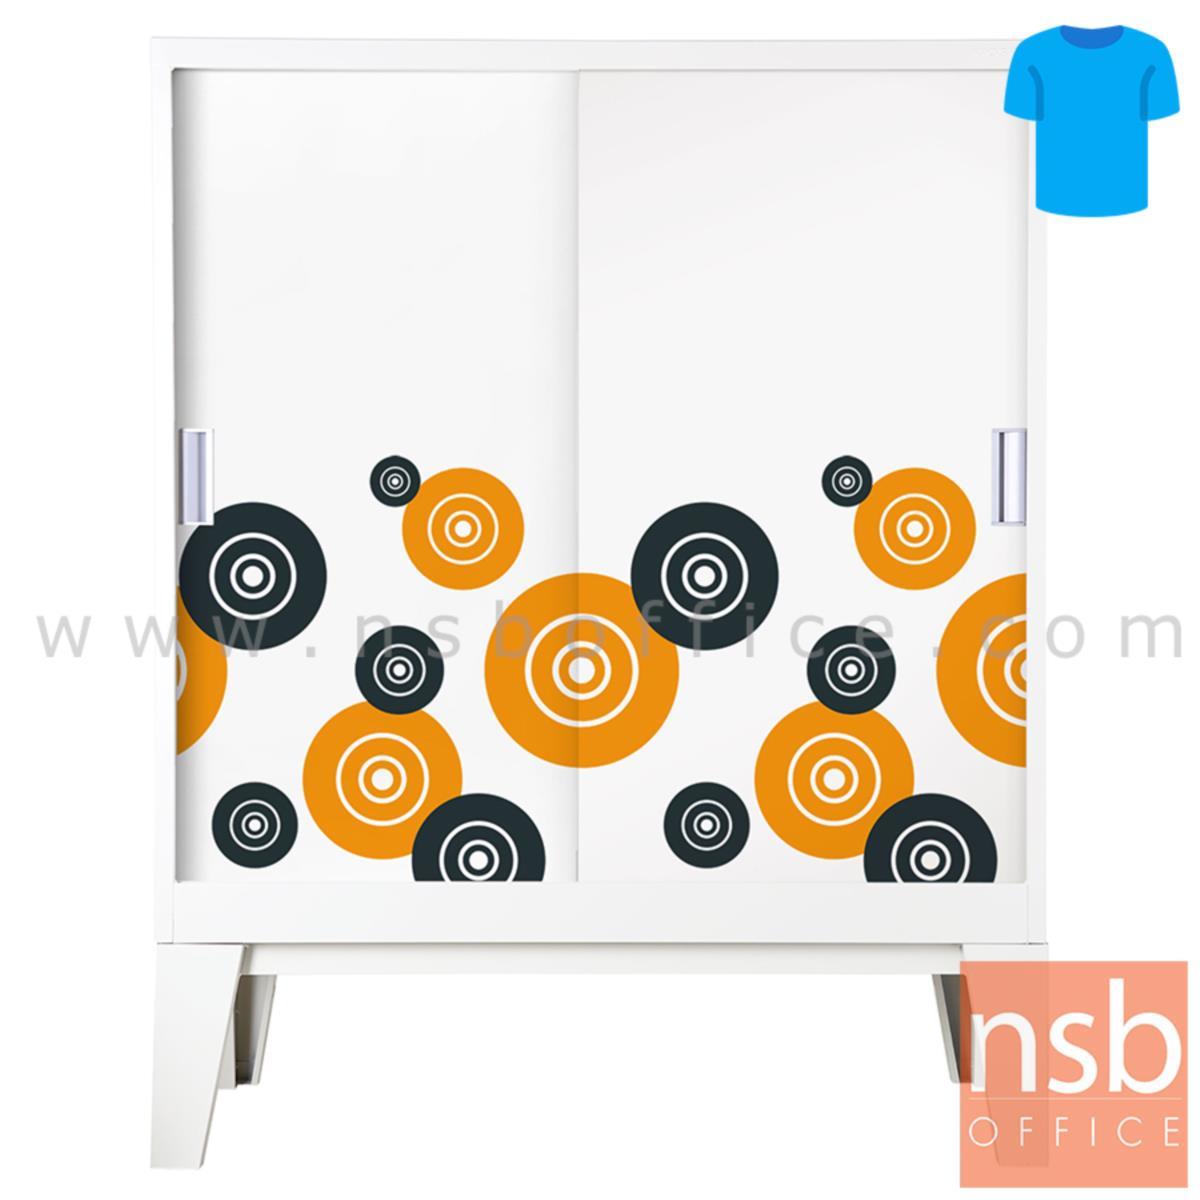 E25A042:ตู้เสื้อผ้าเหล็ก 2 บานเลื่อนทึบเตี้ย 150H cm. ขาลอย ( 10 สี) รุ่น WDC-03